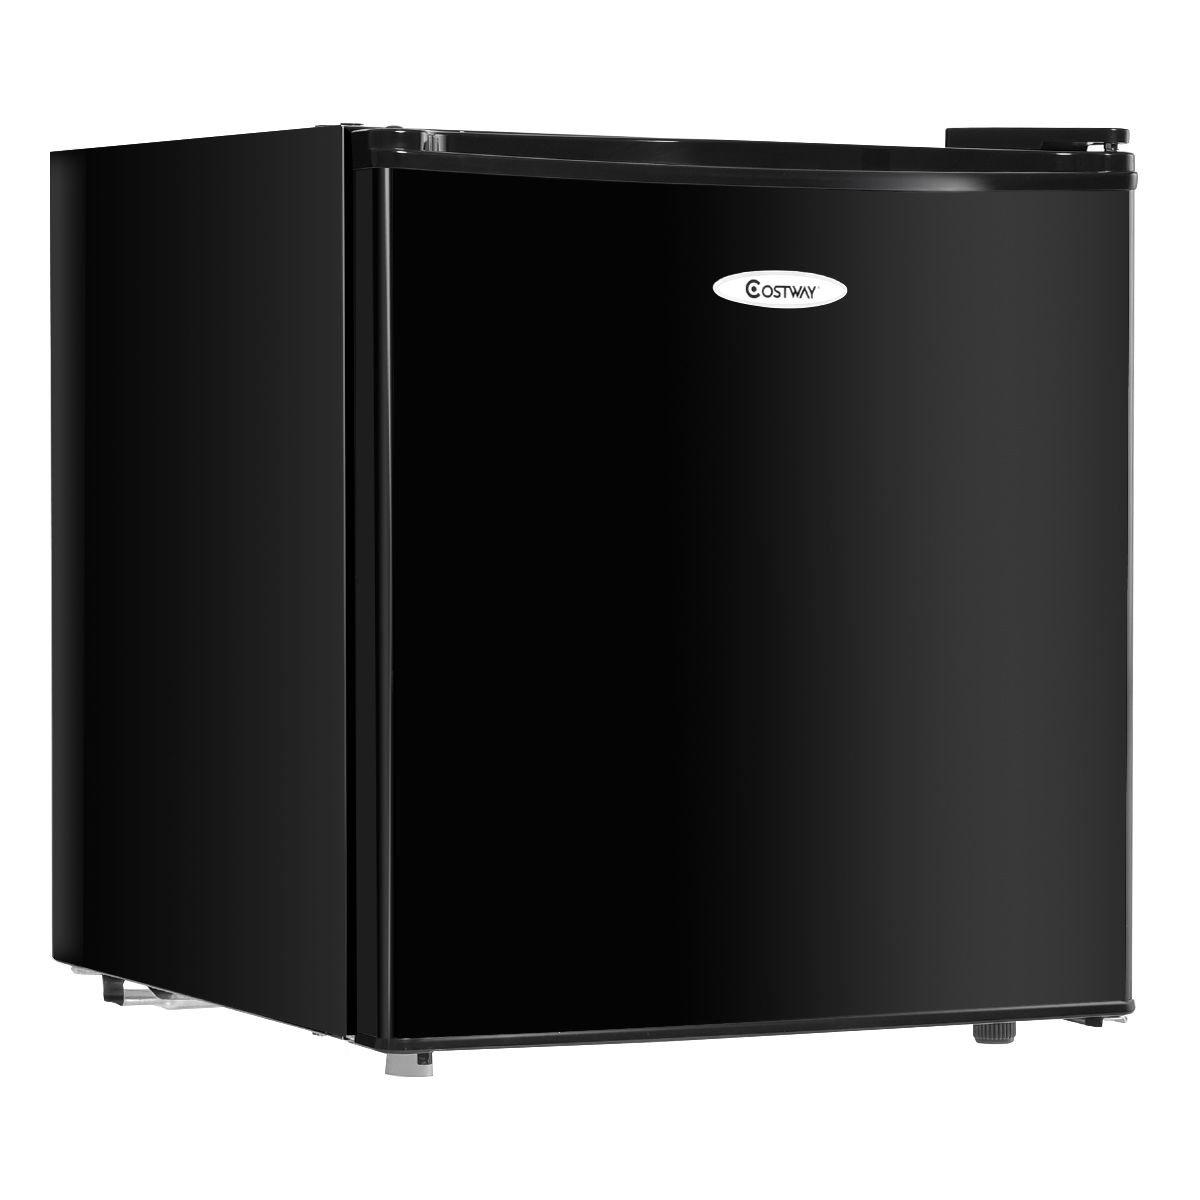 Costway Compact Refrigerator and Freezer With Single Door Cooler Fridge,1.7 Cubic Feet,Unit (Black)